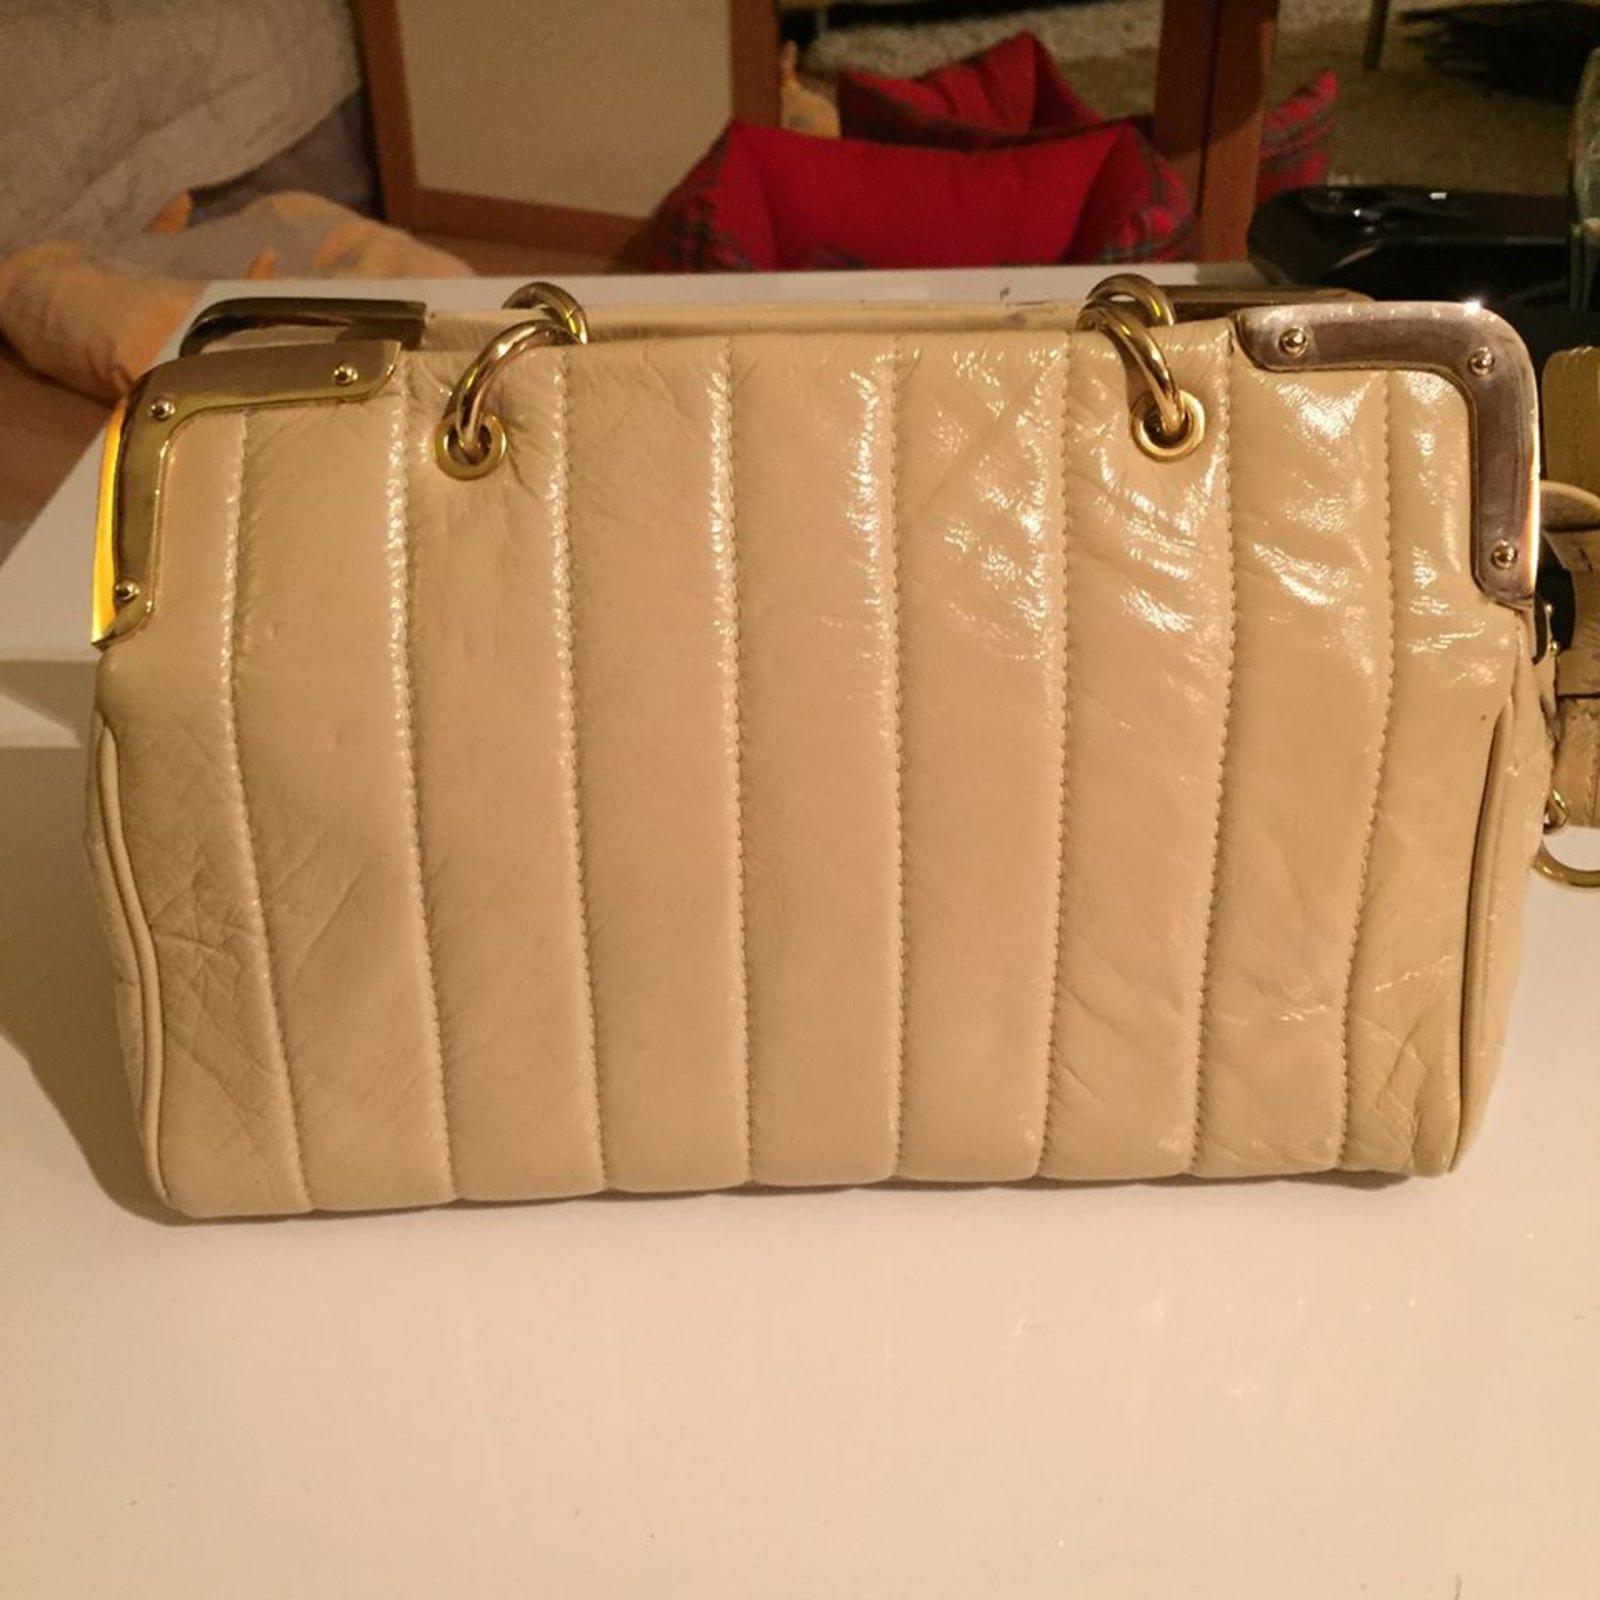 e6ea8b1a19a Luella Handbags Handbags Patent leather Beige ref.7283 - Joli Closet